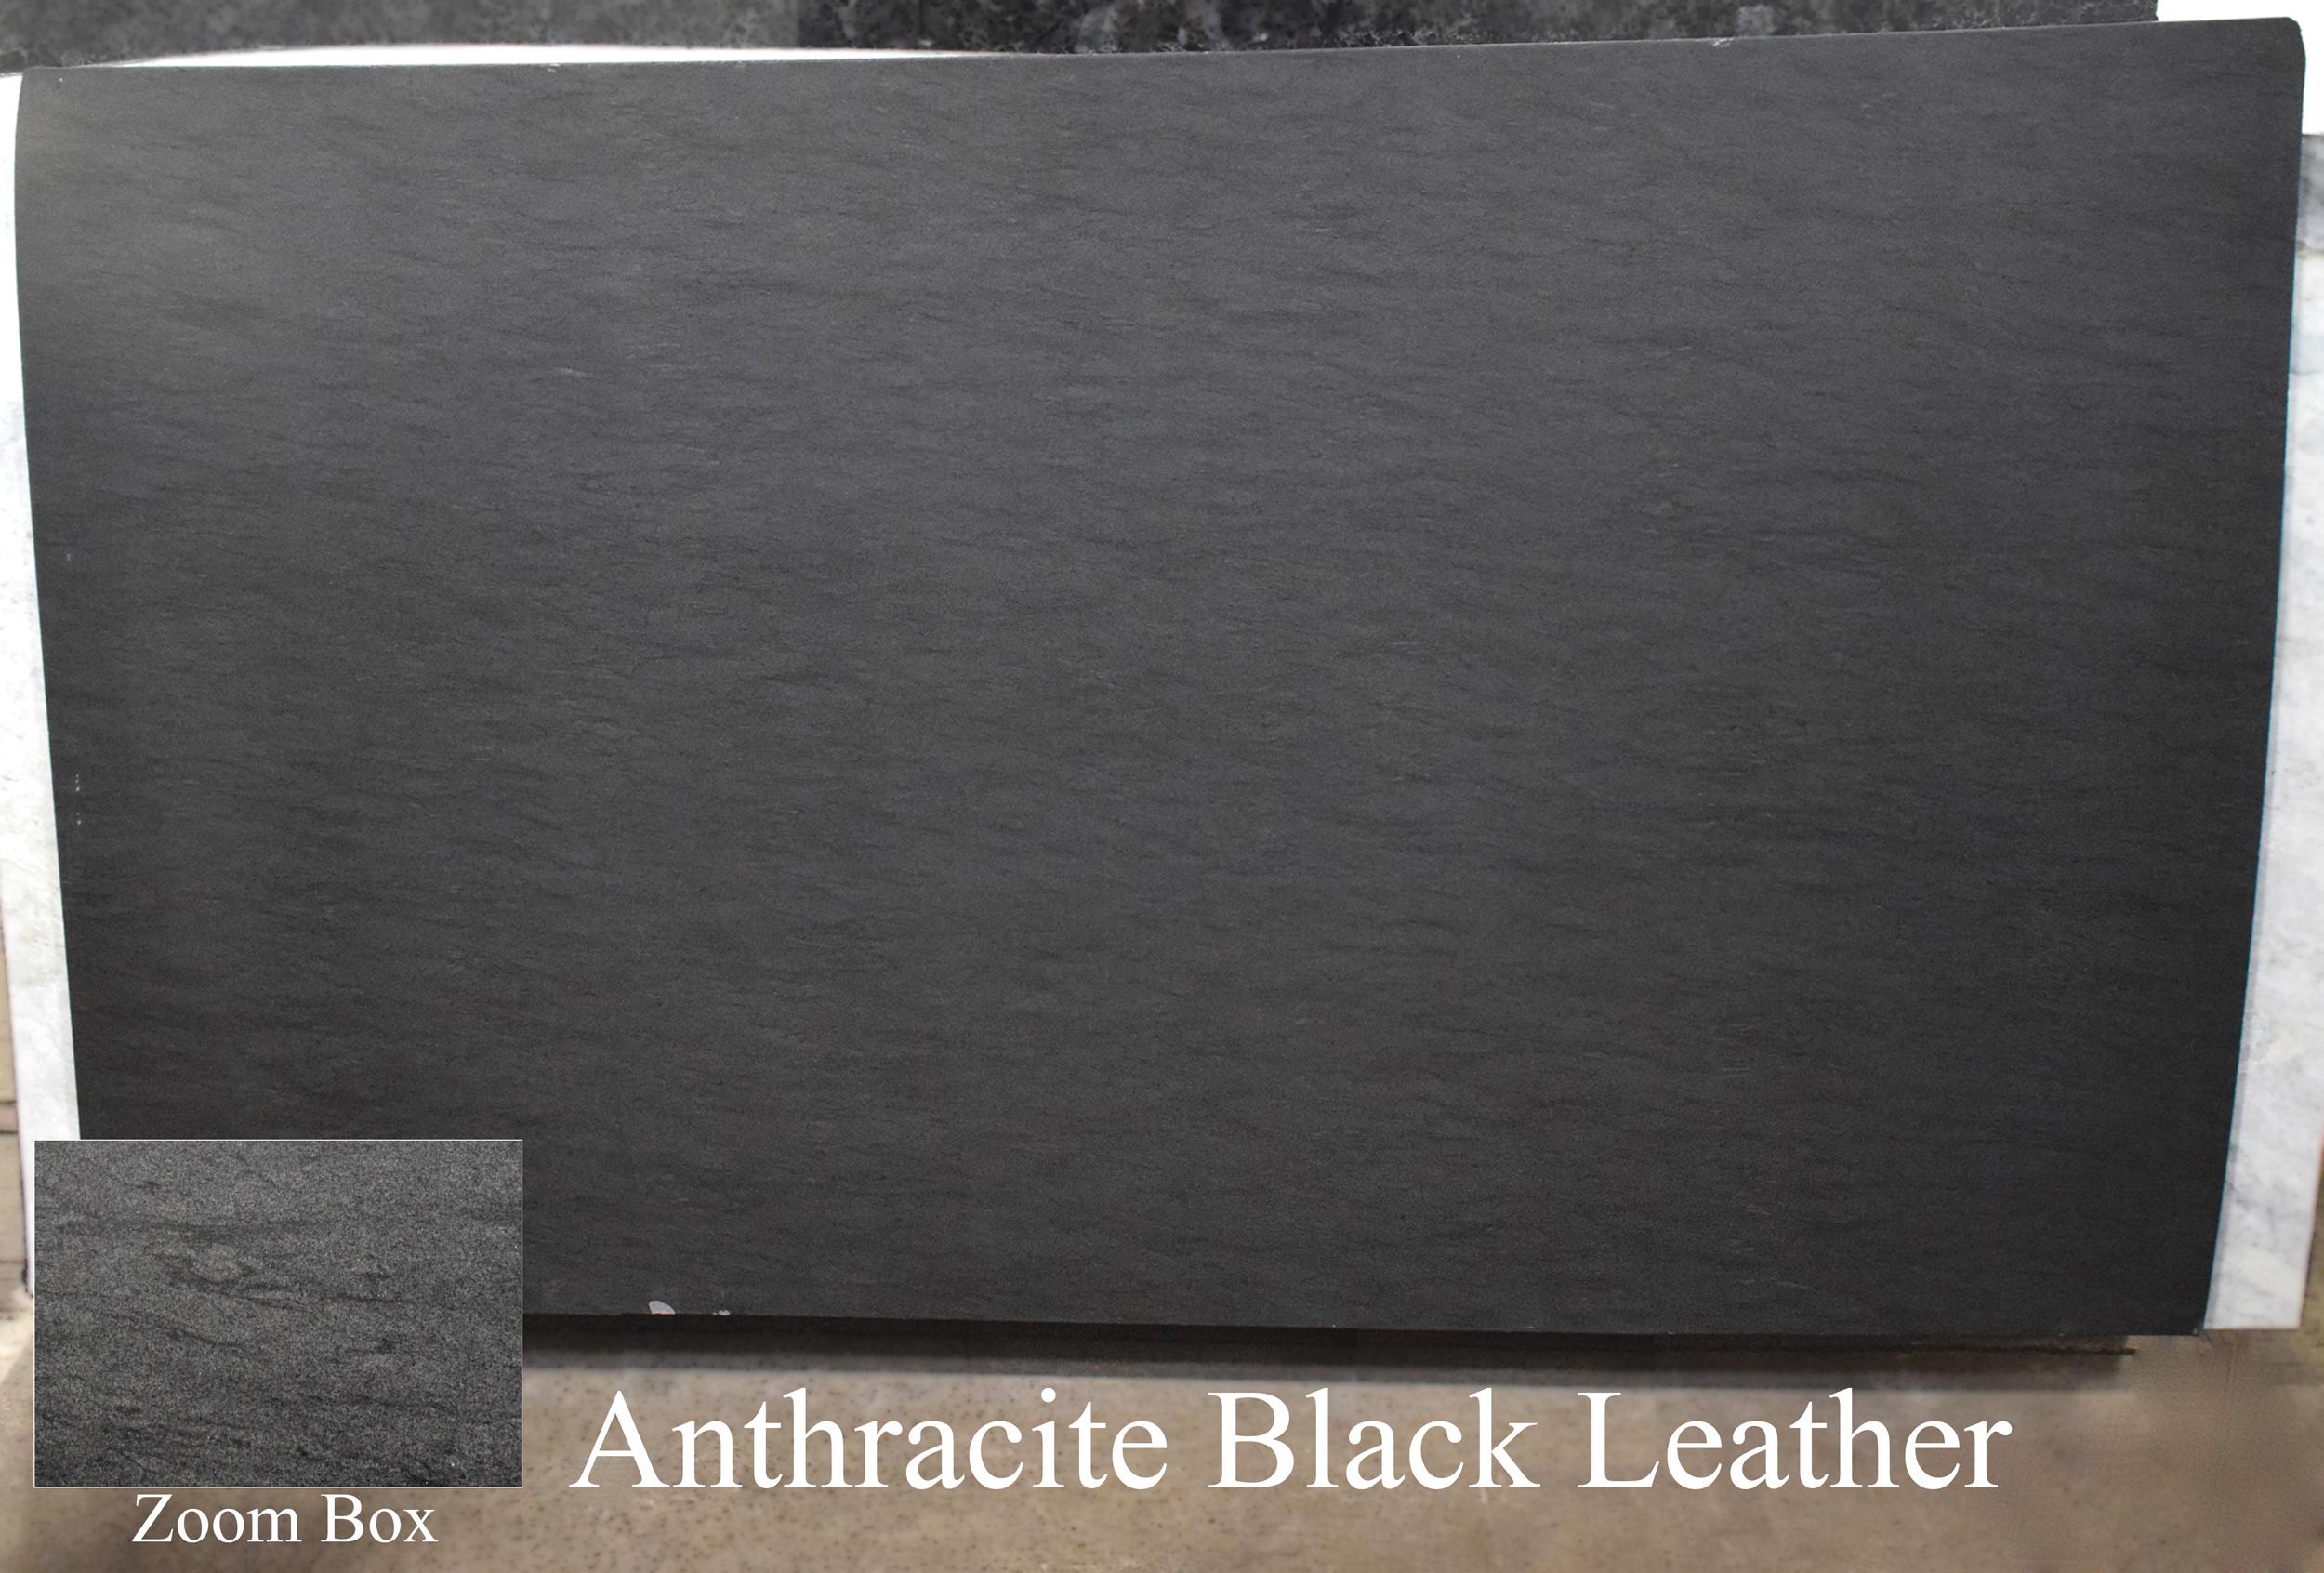 ANTHRACITE BLACK LEATHER